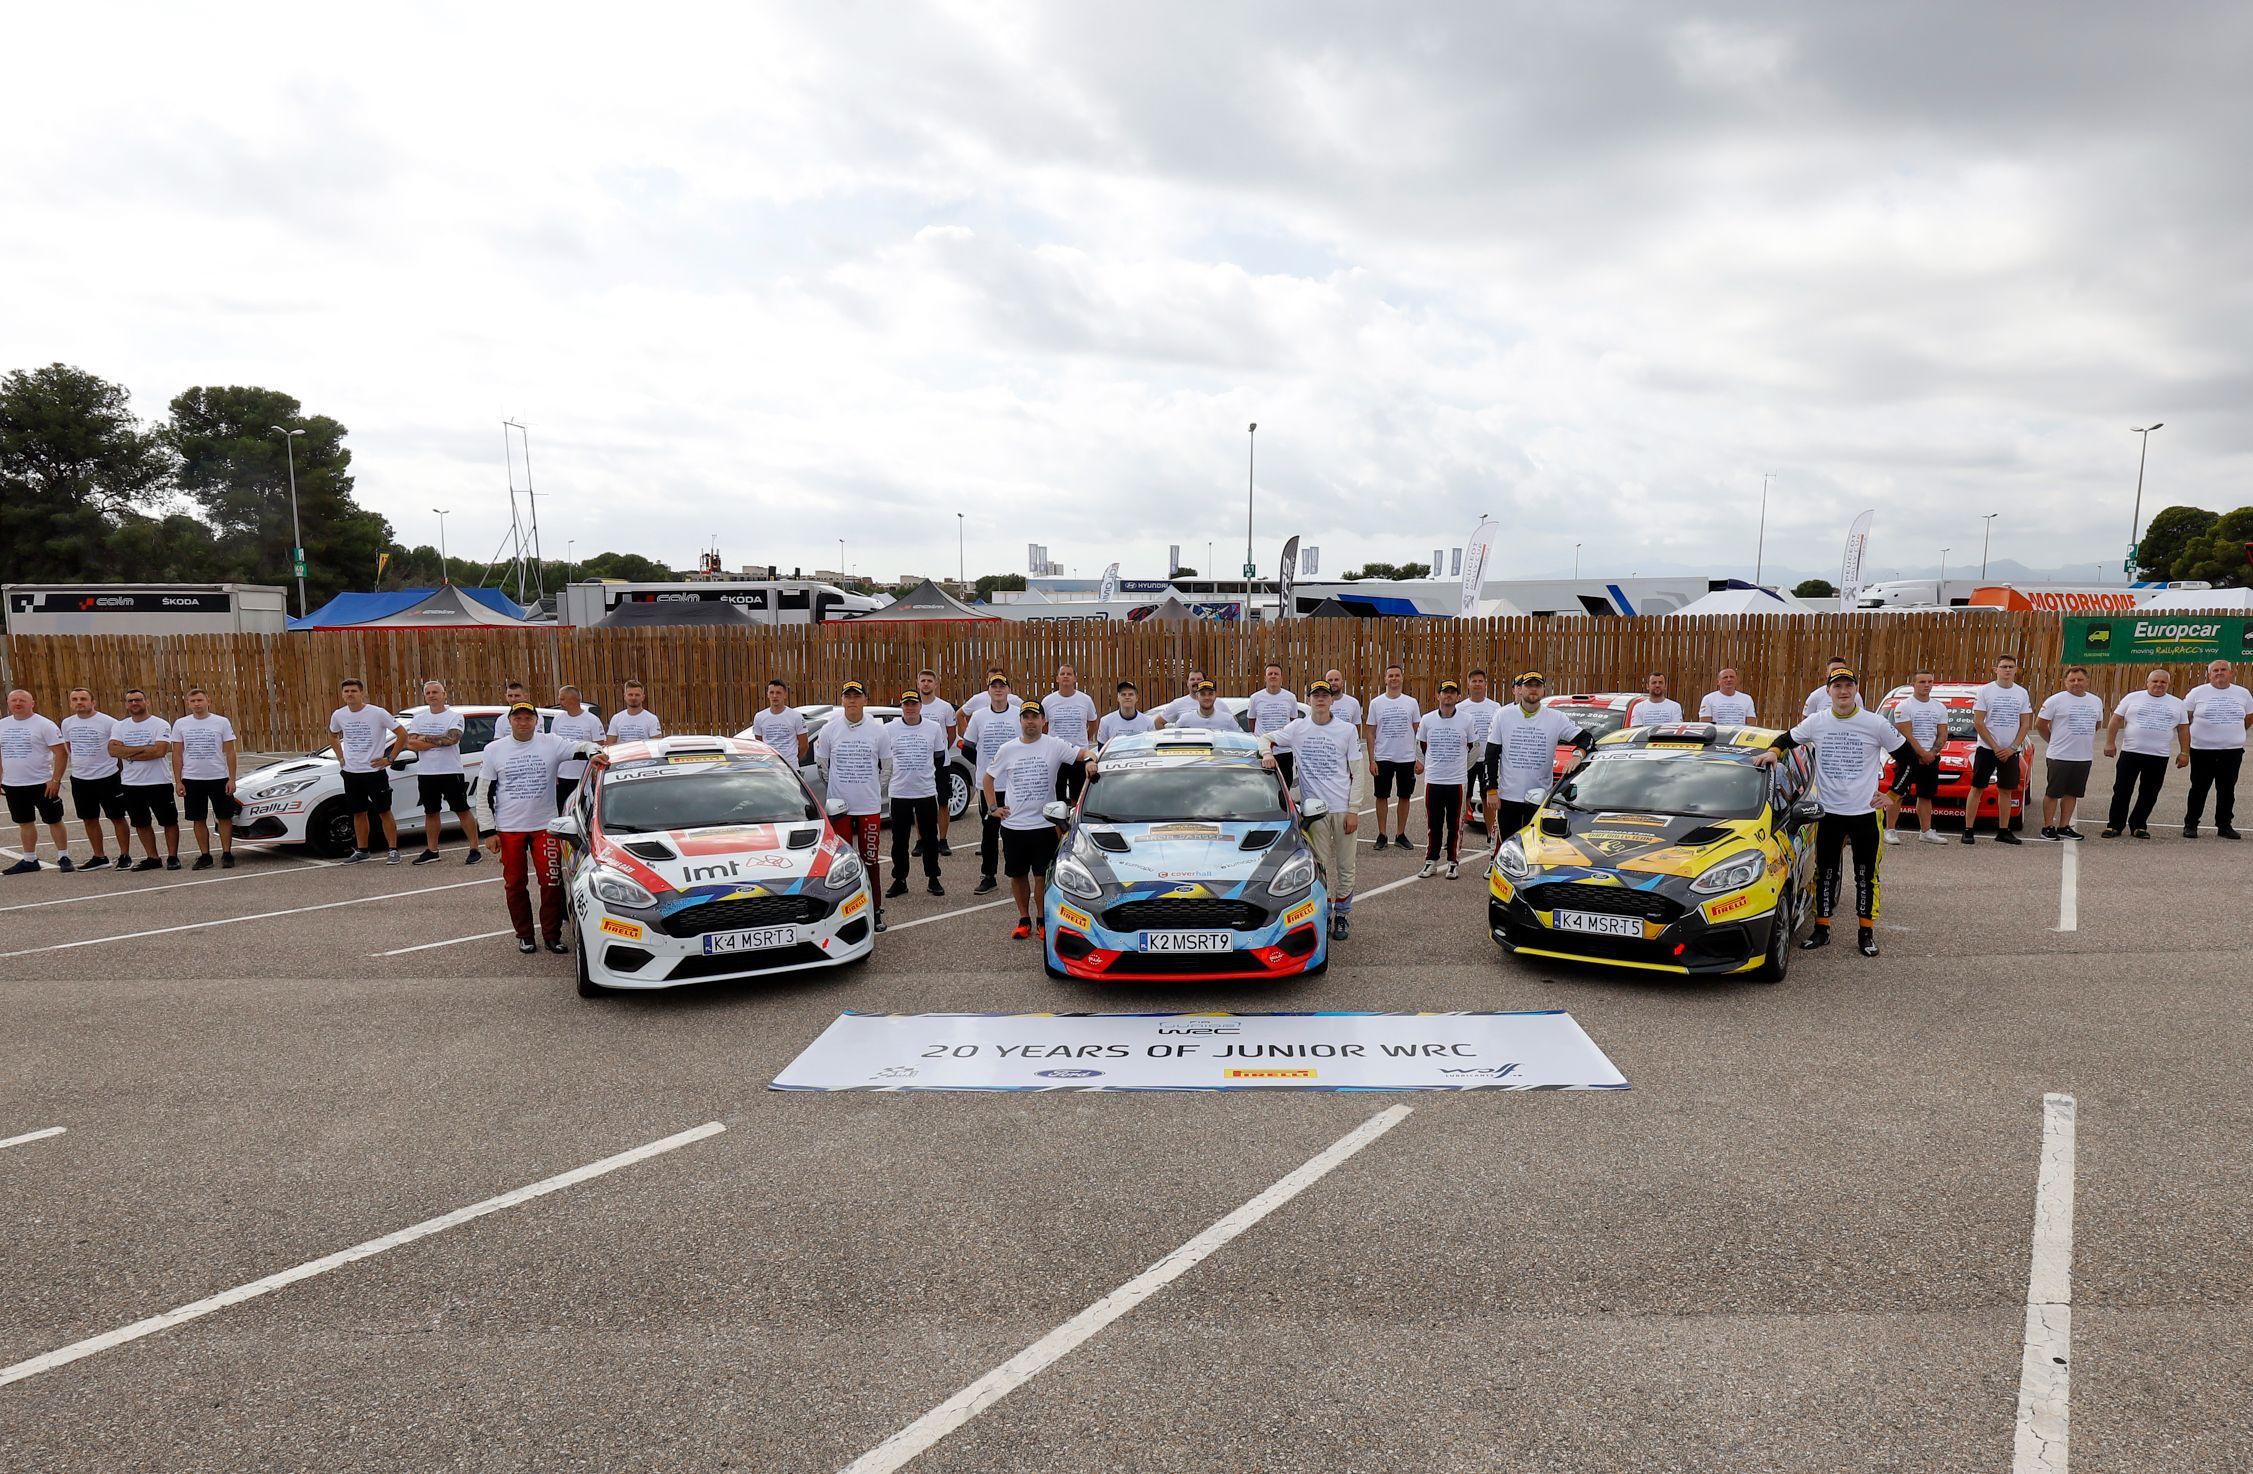 WRC: 56º RallyRACC Catalunya Costa Daurada - Rally de España [14-17 Octubre] - Página 3 FBrCOgDXIAgzb3f?format=jpg&name=4096x4096